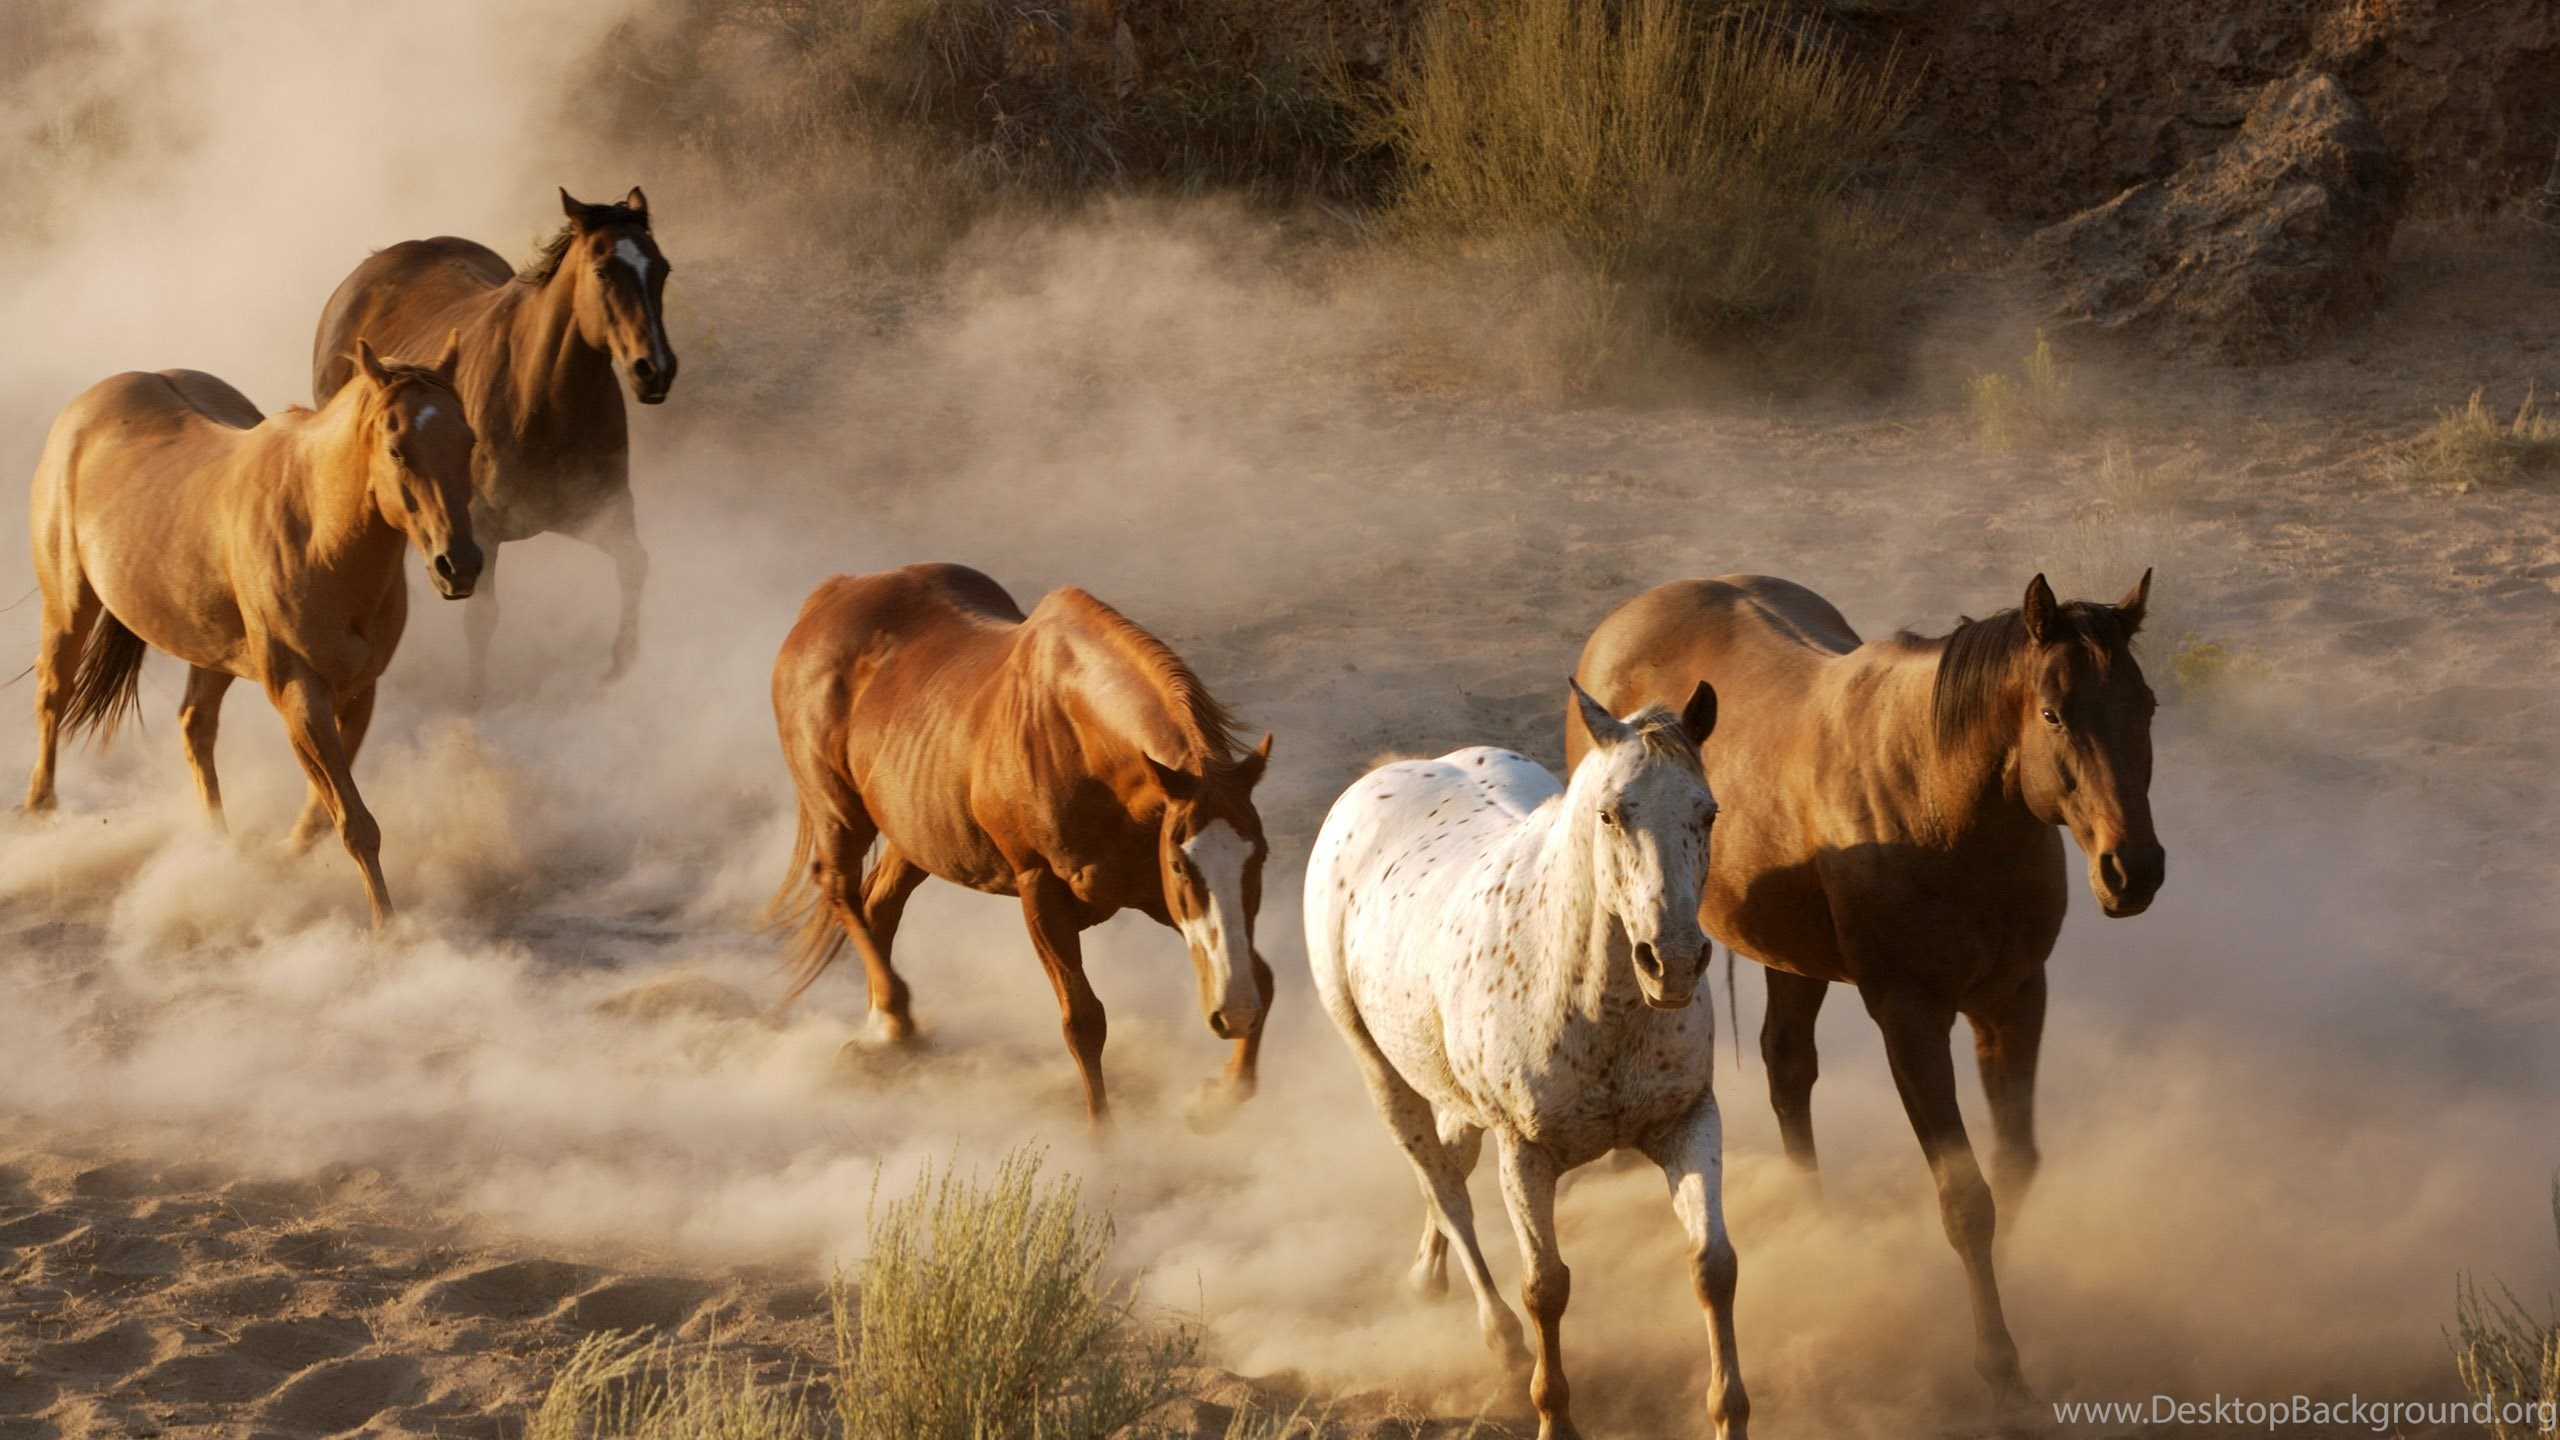 Horses wallpapers 2 desktop background netbook voltagebd Image collections